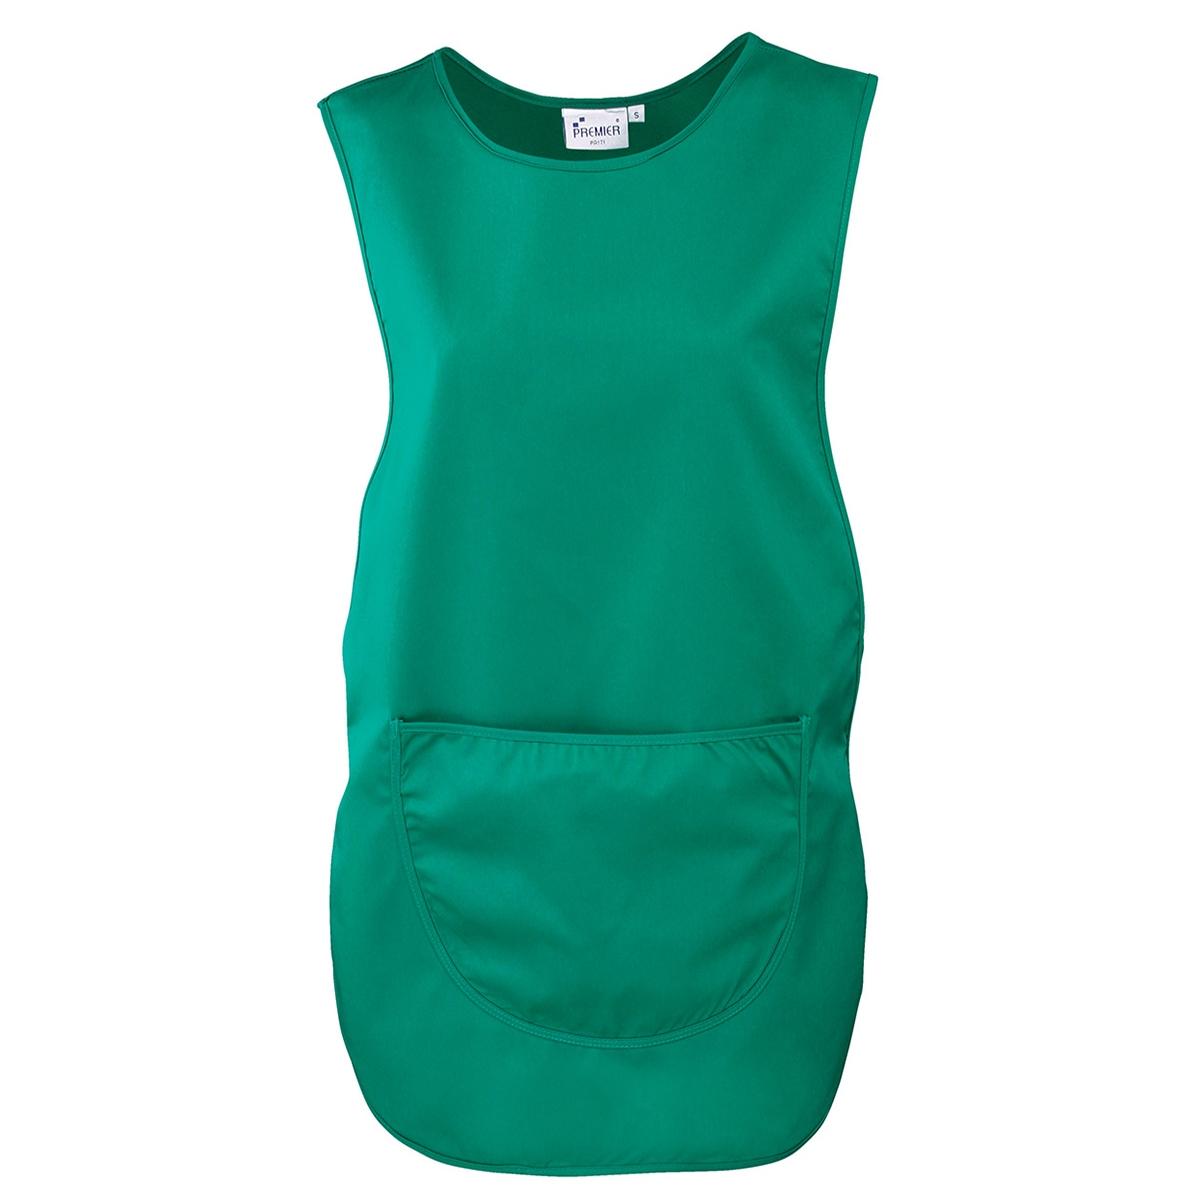 EMER   emerald